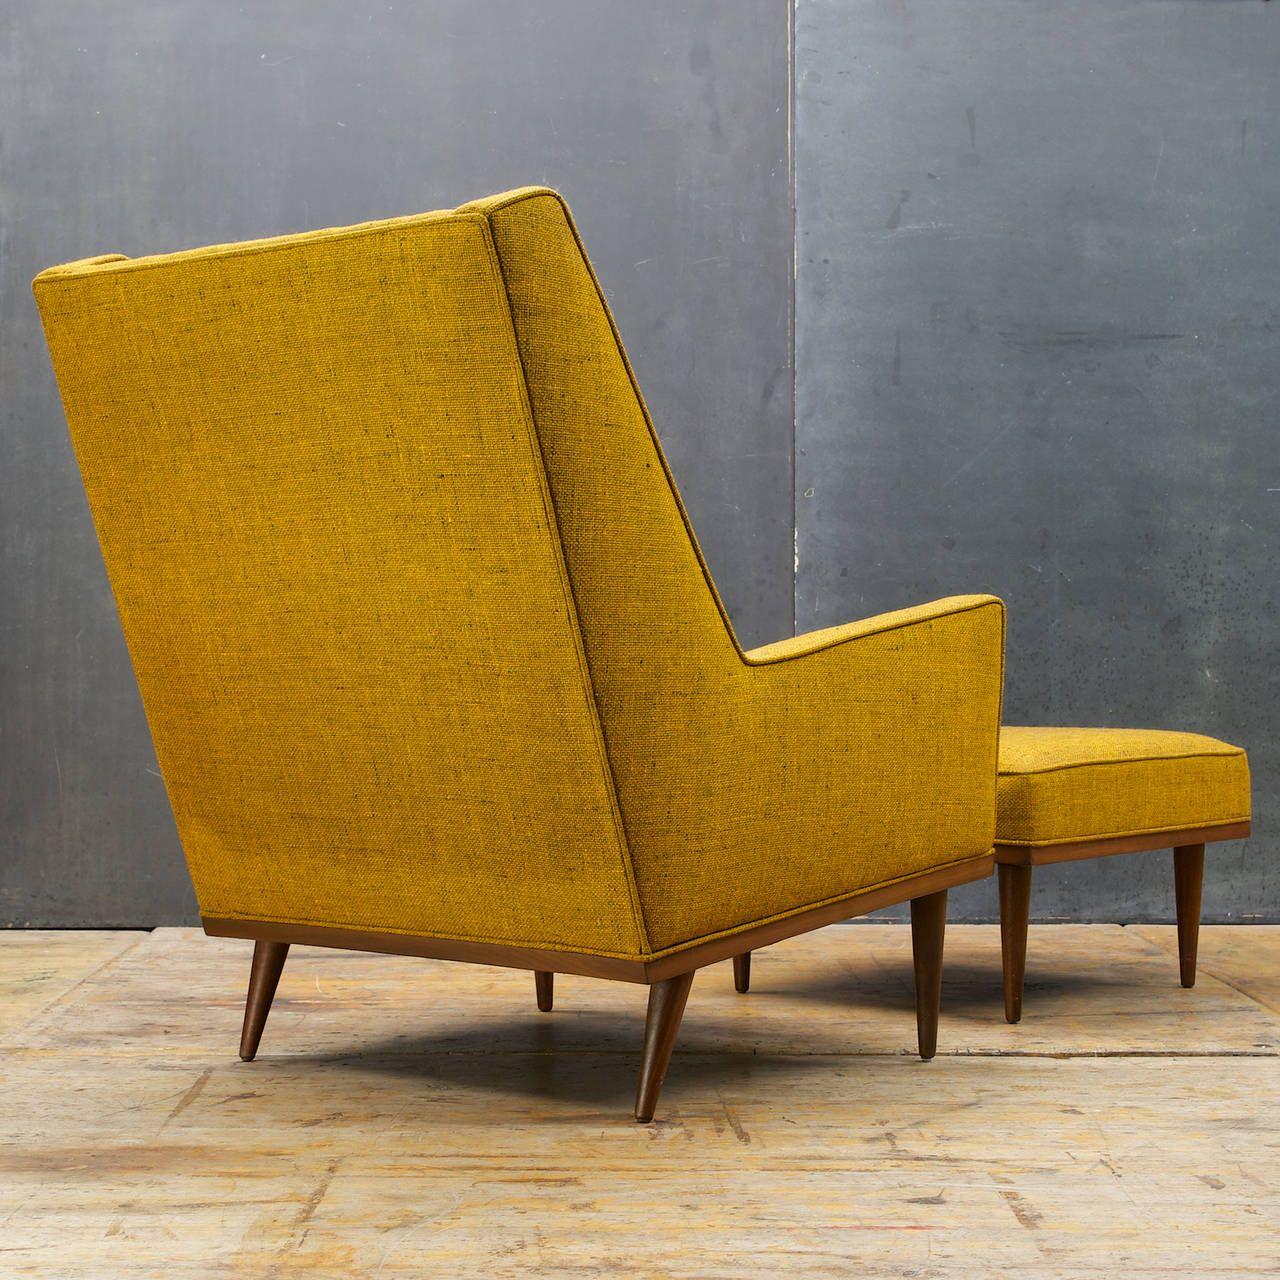 Marvelous Milo Baughman Highback Articulate Chair Ottoman Modernist Forskolin Free Trial Chair Design Images Forskolin Free Trialorg